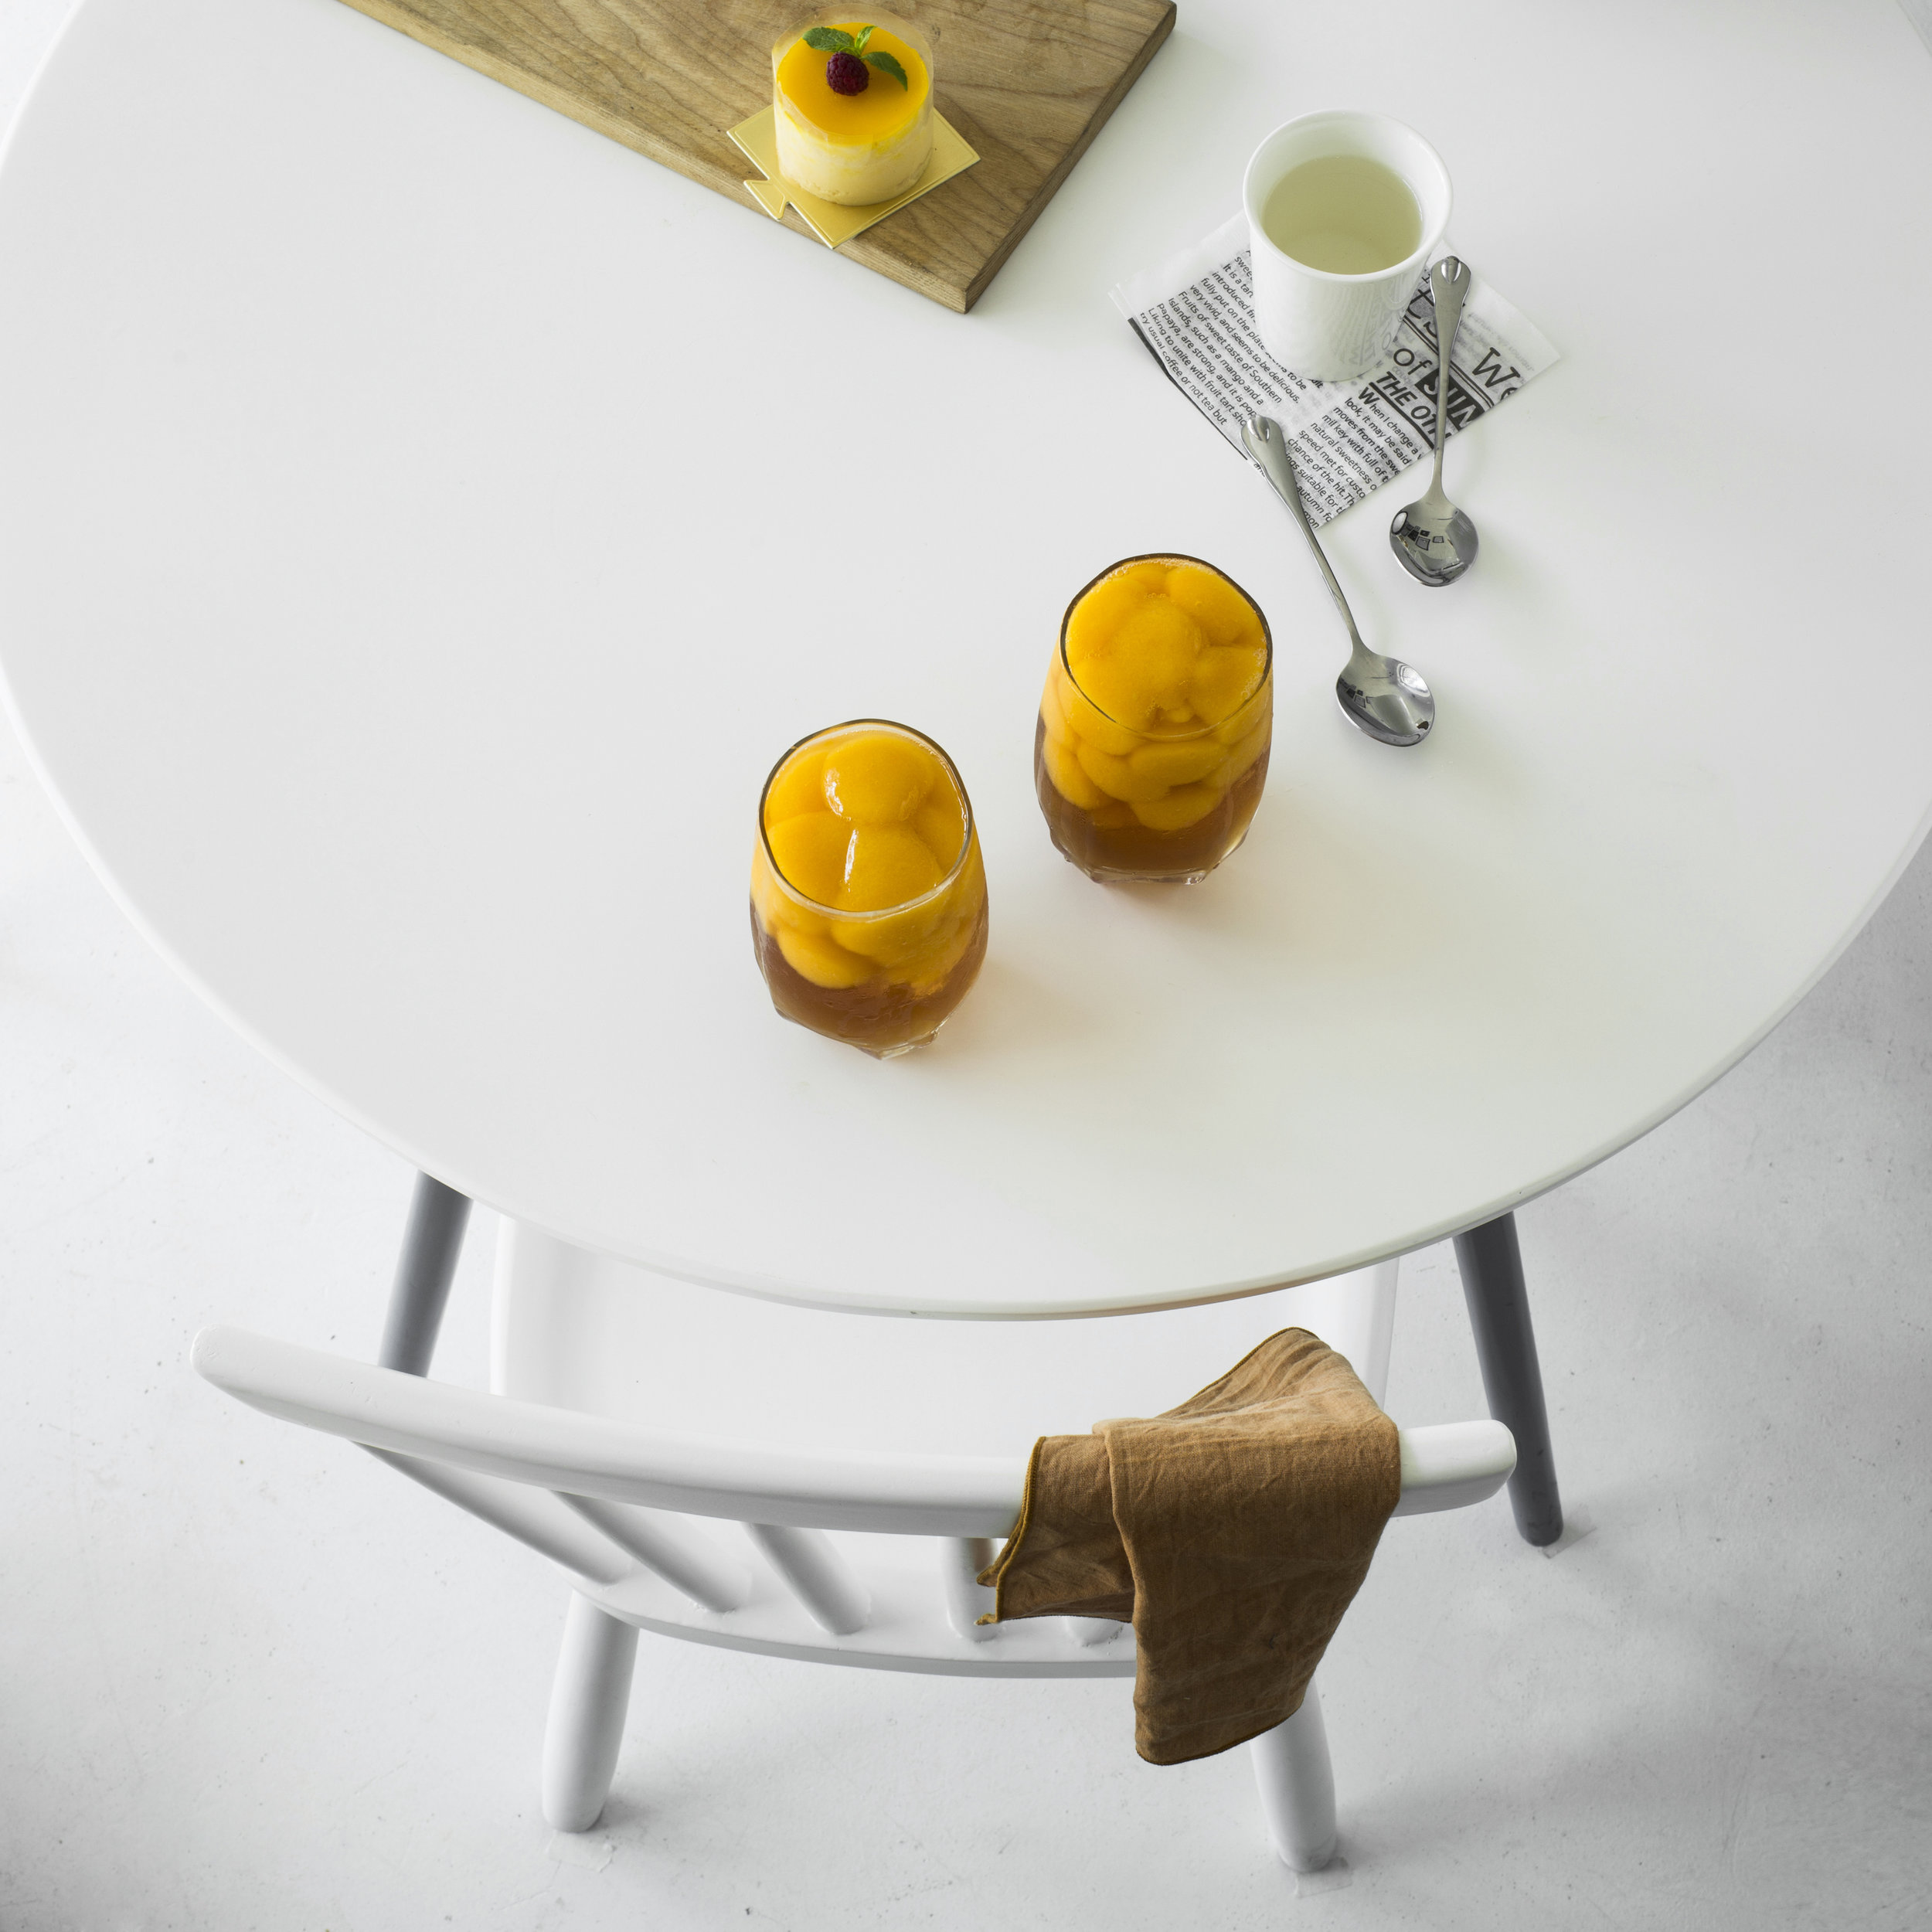 40mm Pancake - Synary Tea Room